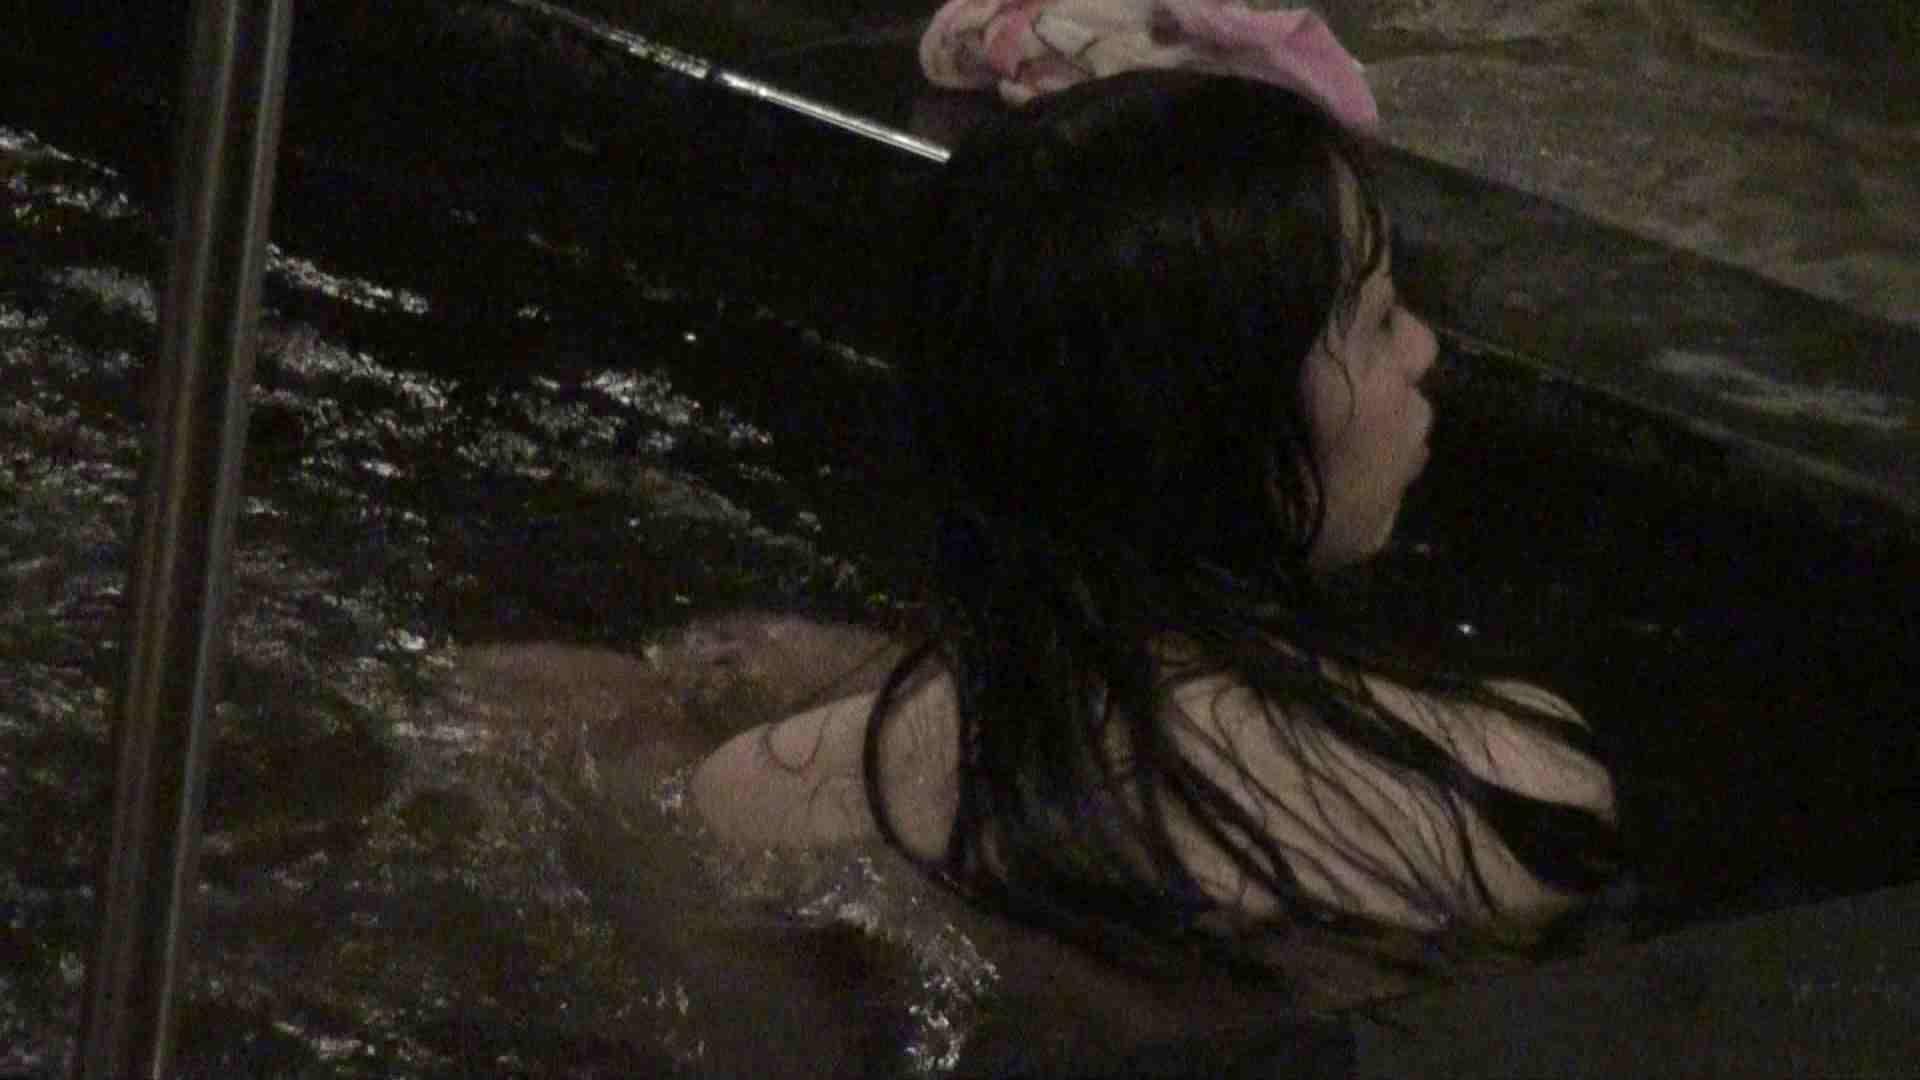 Aquaな露天風呂Vol.381 盗撮師作品  97pic 75